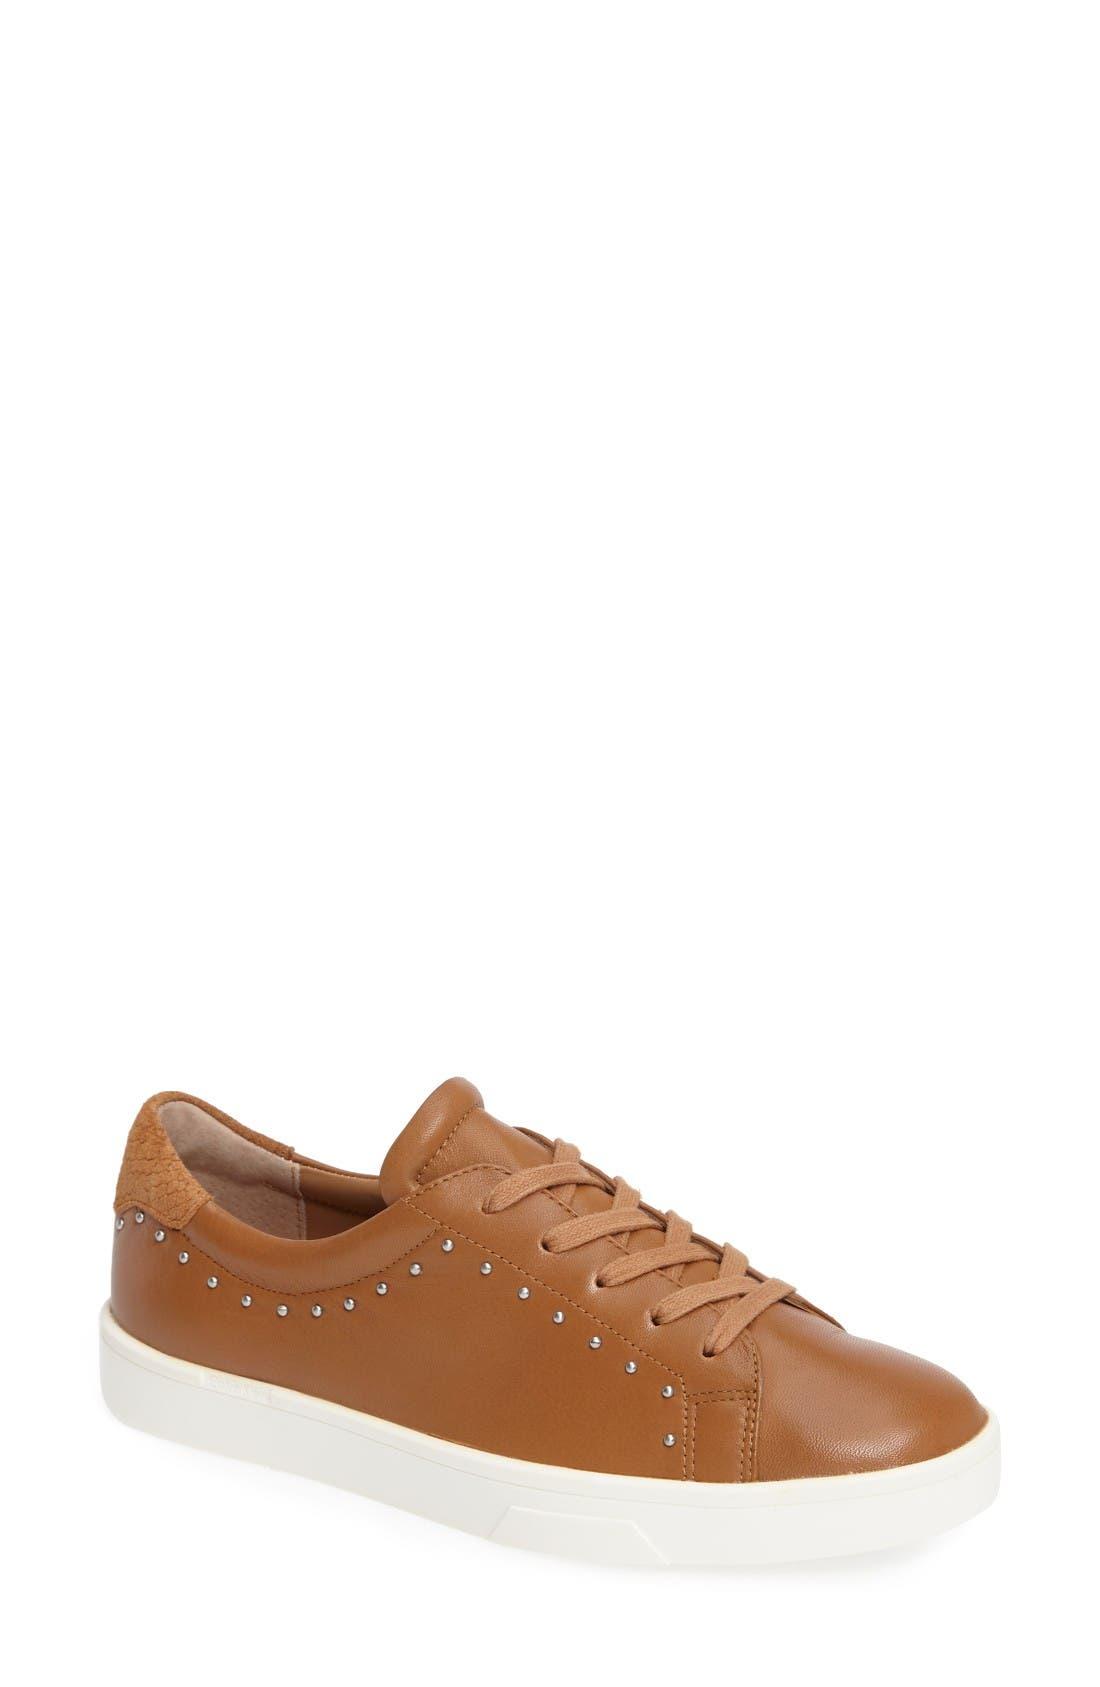 CALVIN KLEIN Illia Studded Platform Sneaker